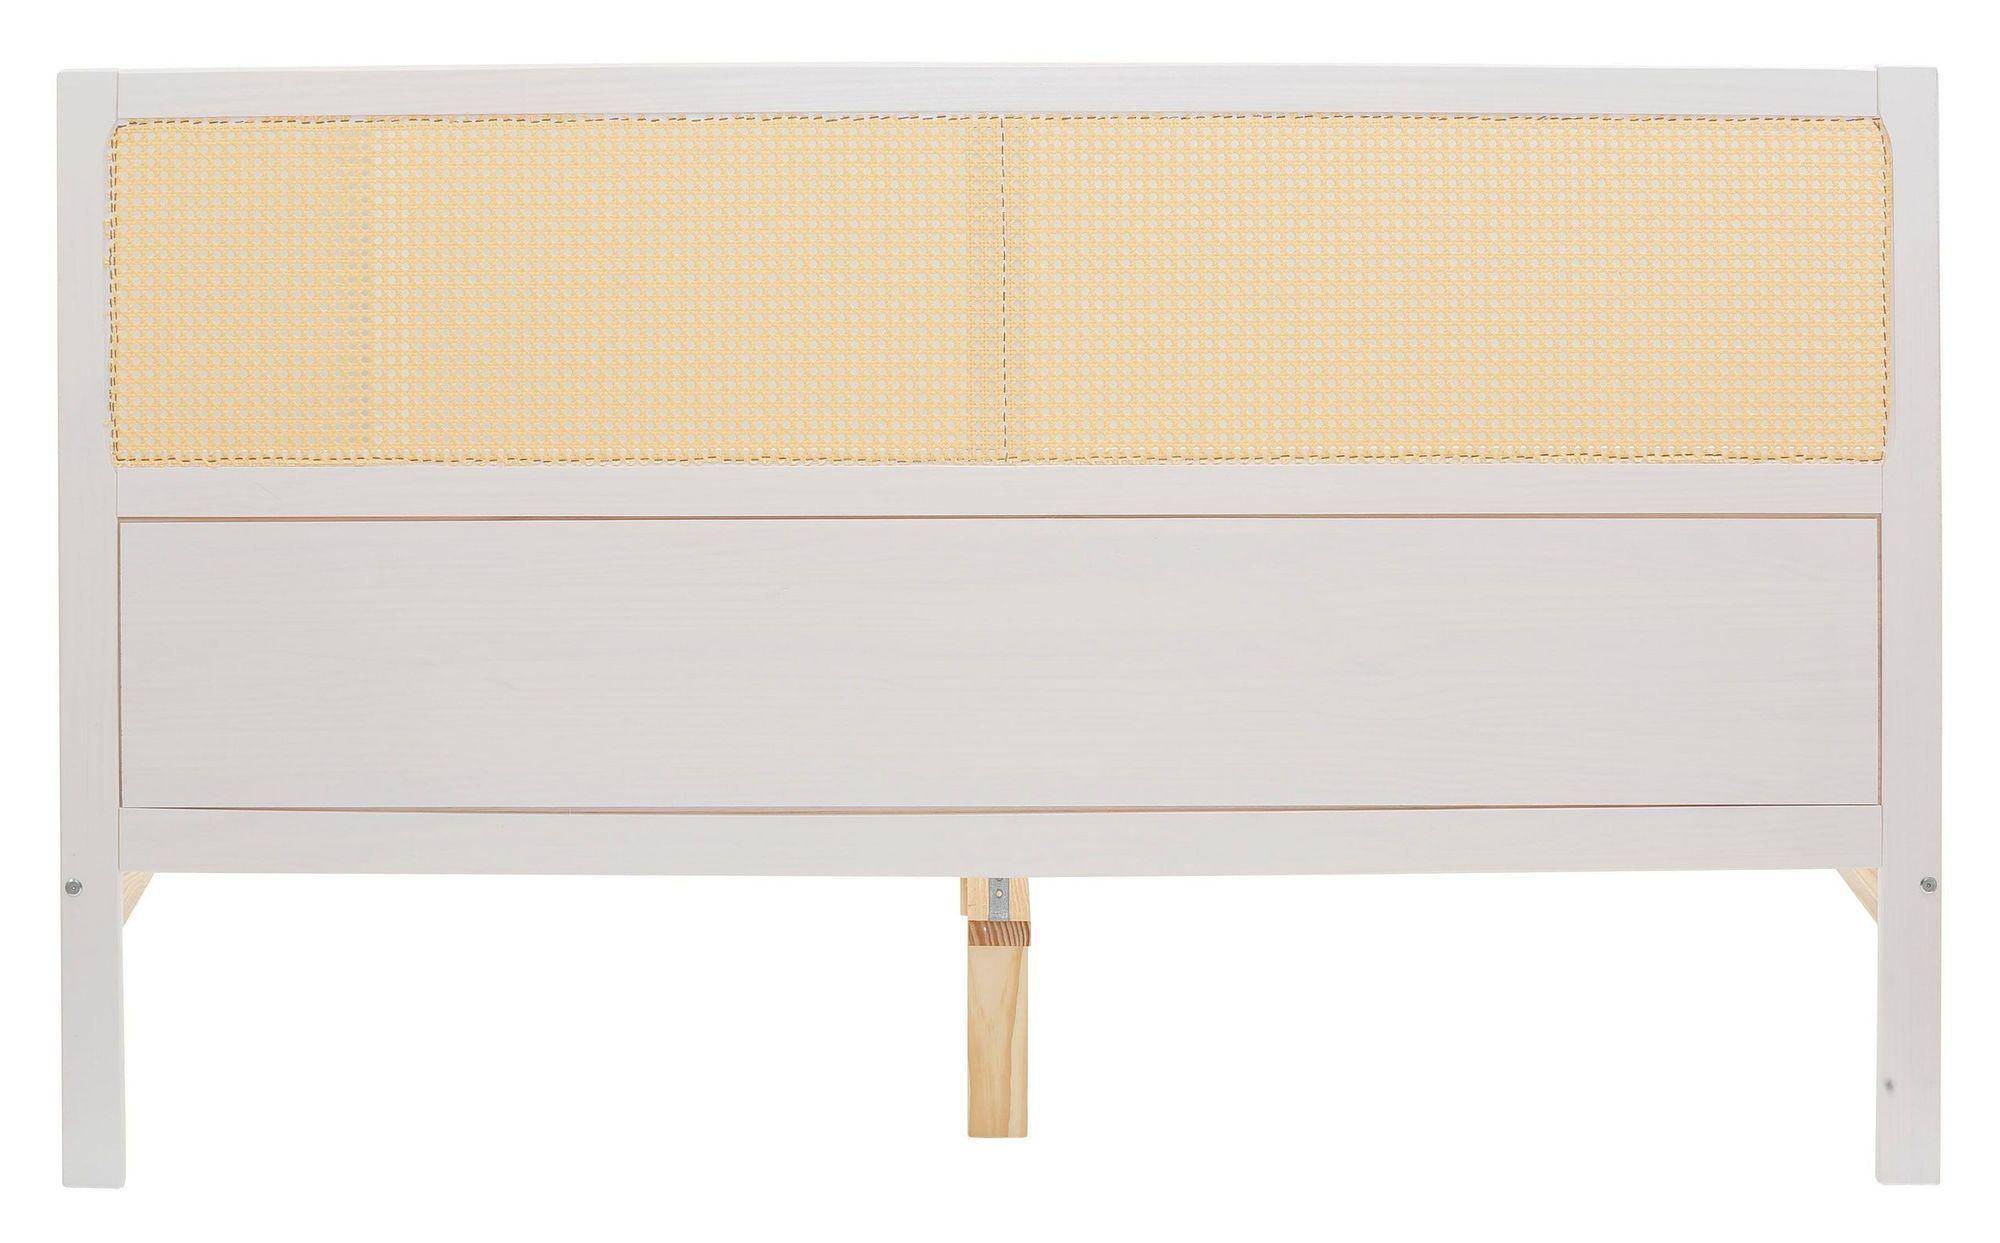 Oxford Sengeramme - Hvid/Rattan, 200x180